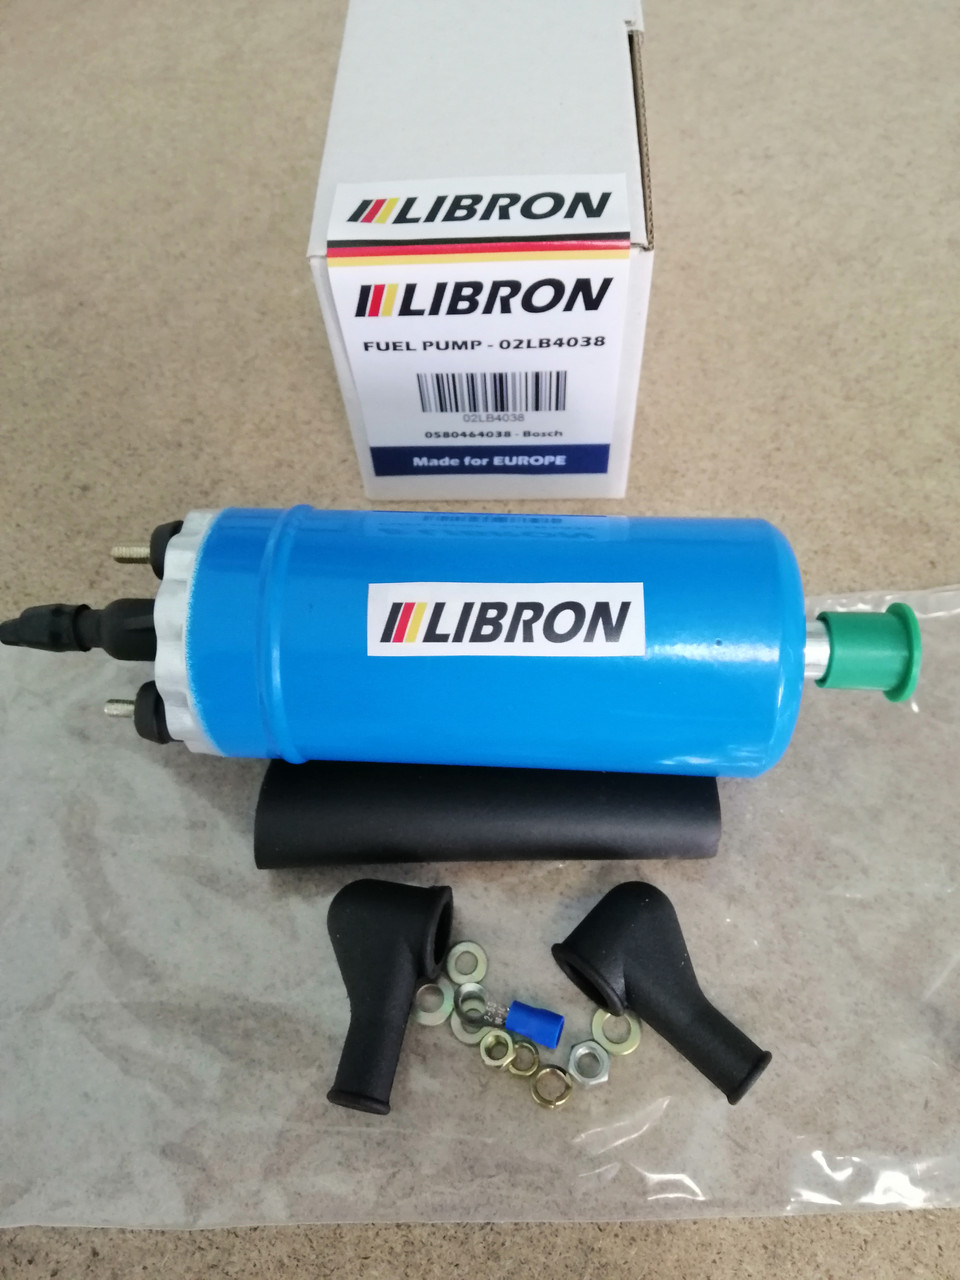 Бензонасос LIBRON 02LB4038 - Ягуар XJ 12 5.3 (1986-1989)